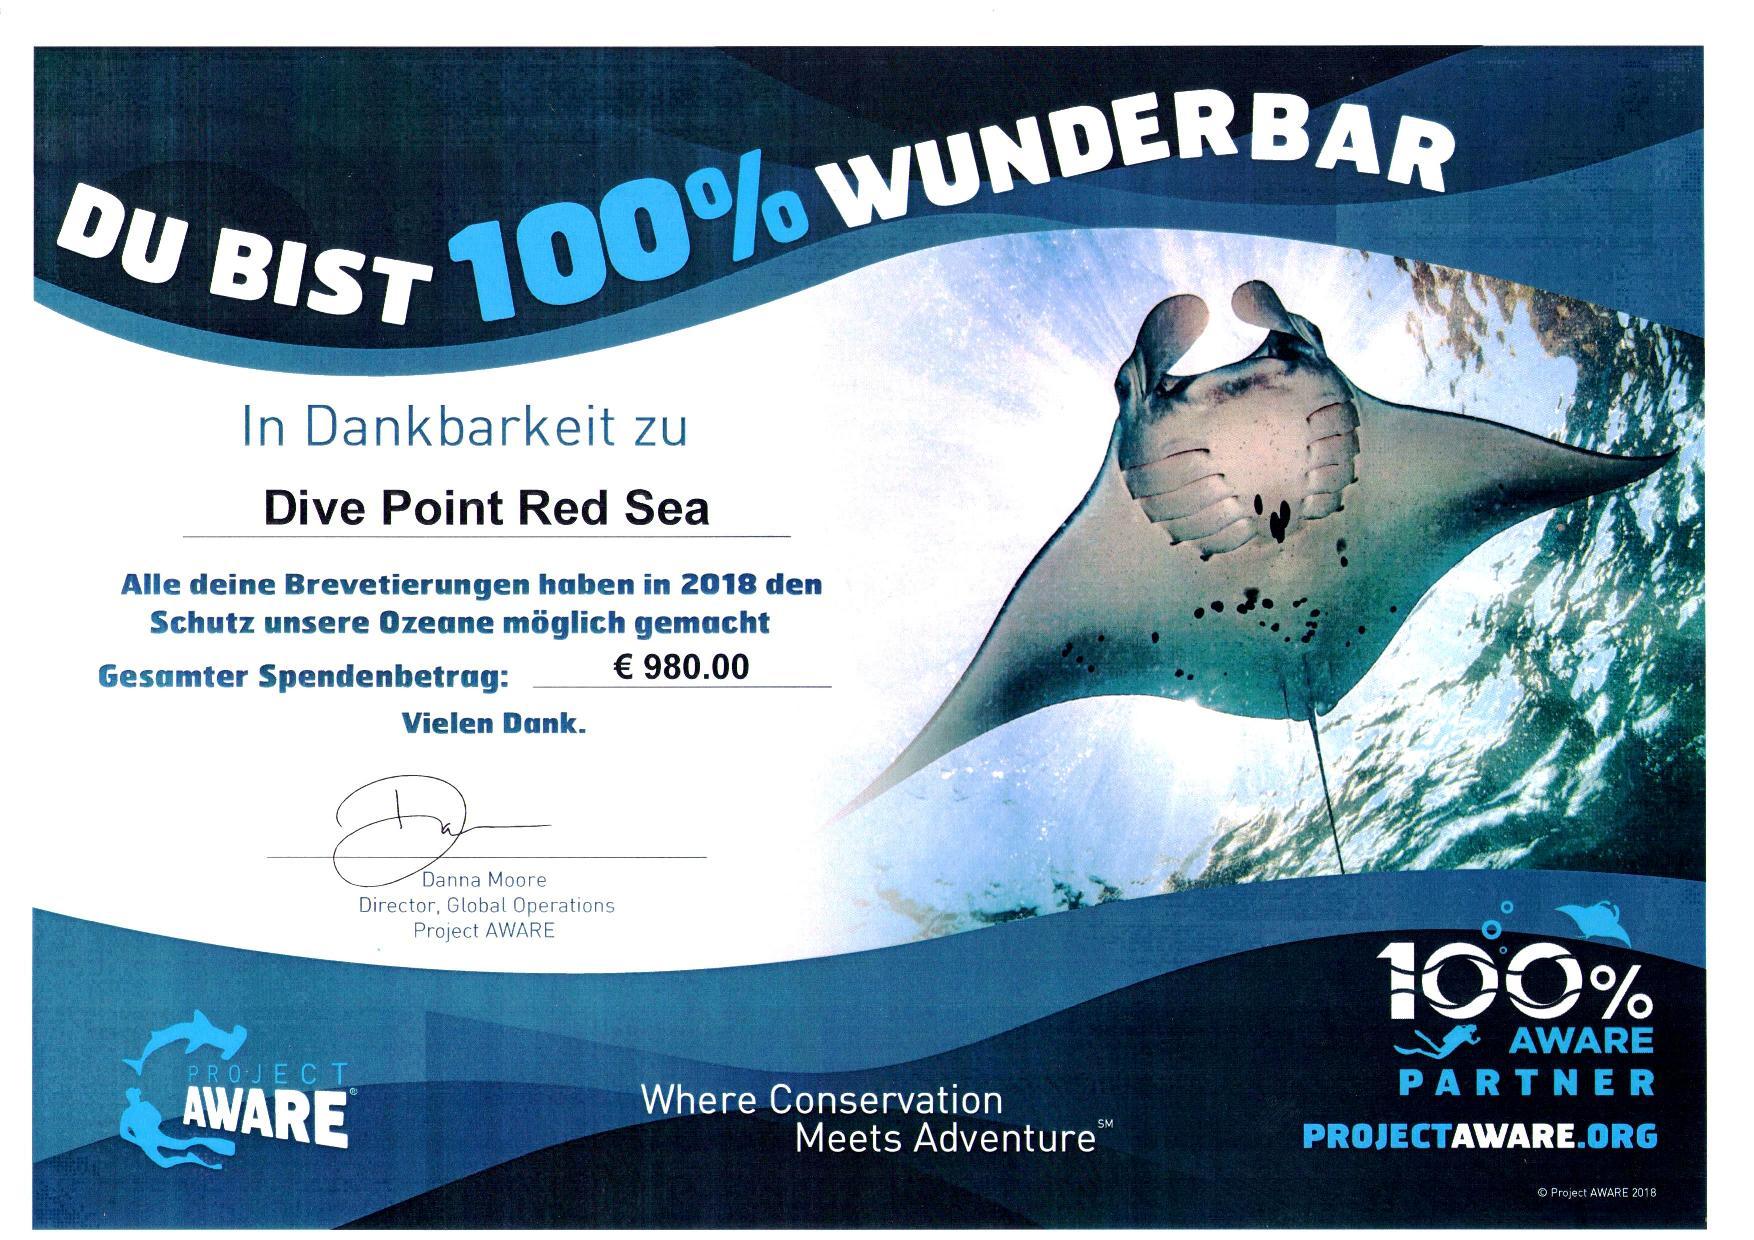 Wir sind 100% WUNDERBAR!